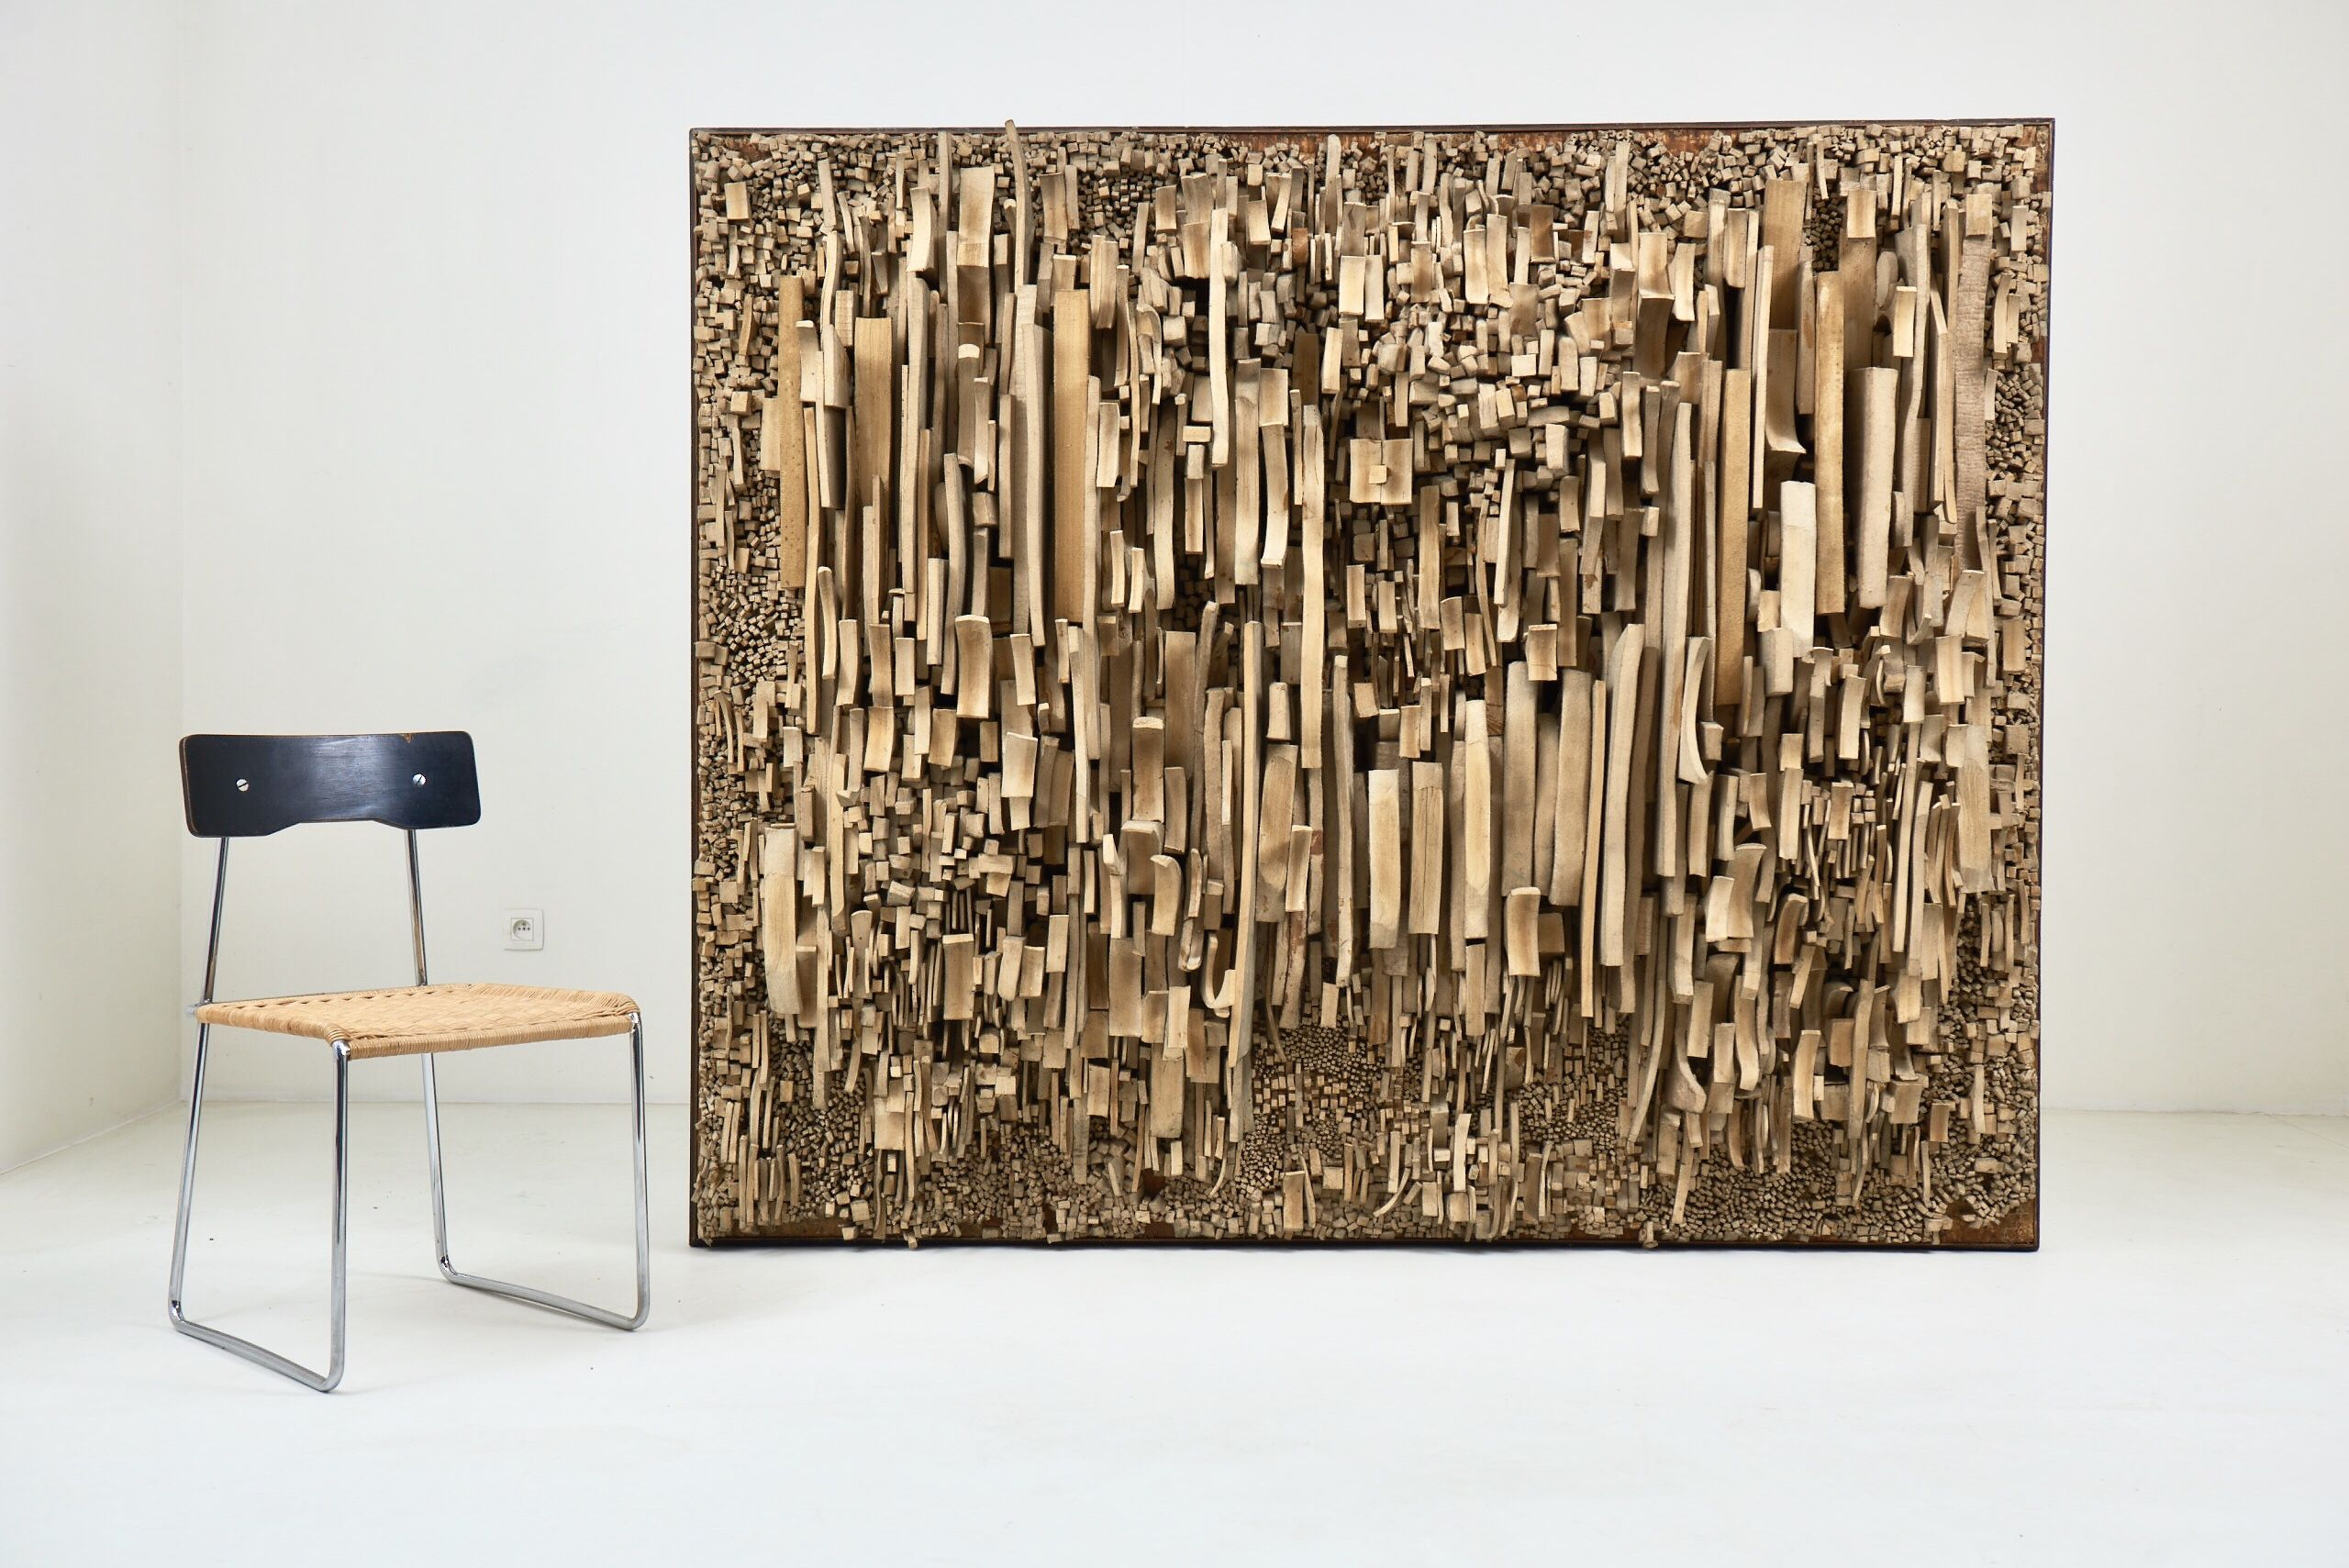 Andre Bogaert Monumental Assemblage 1969 Design Art Vintage Designs Art Gallery